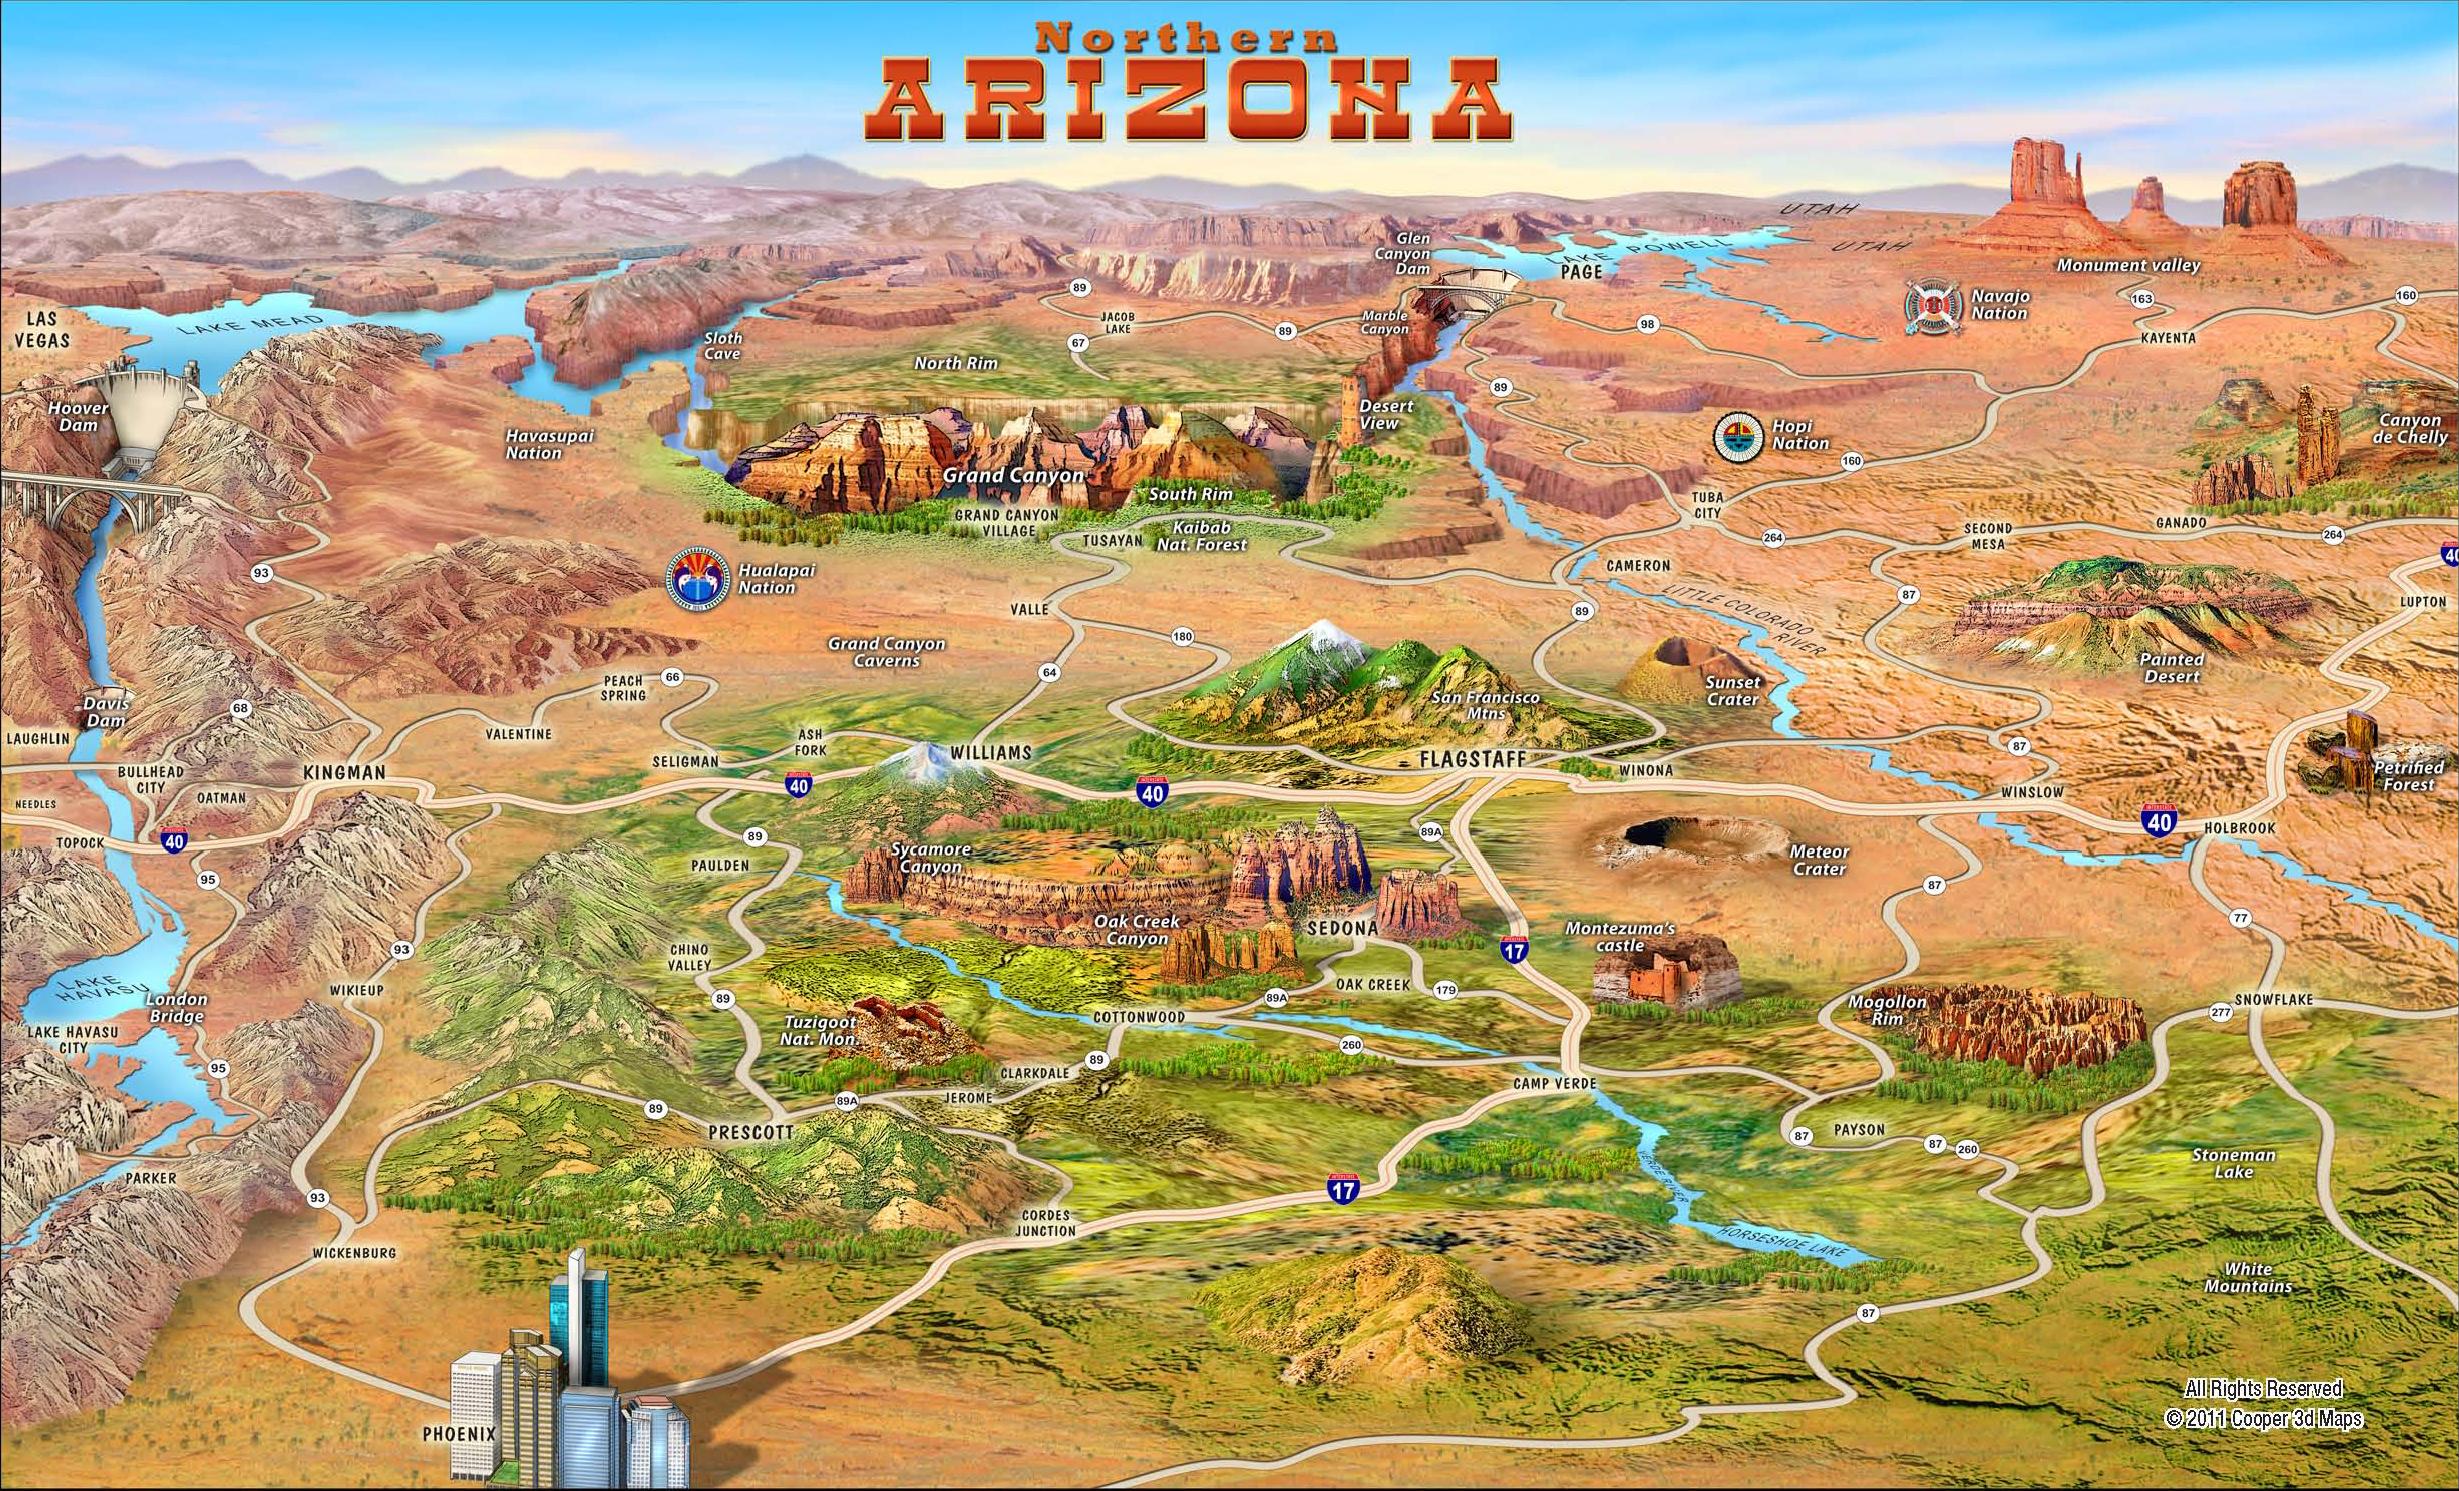 Northern Arizona Attractions Map  Arizona  Mappery